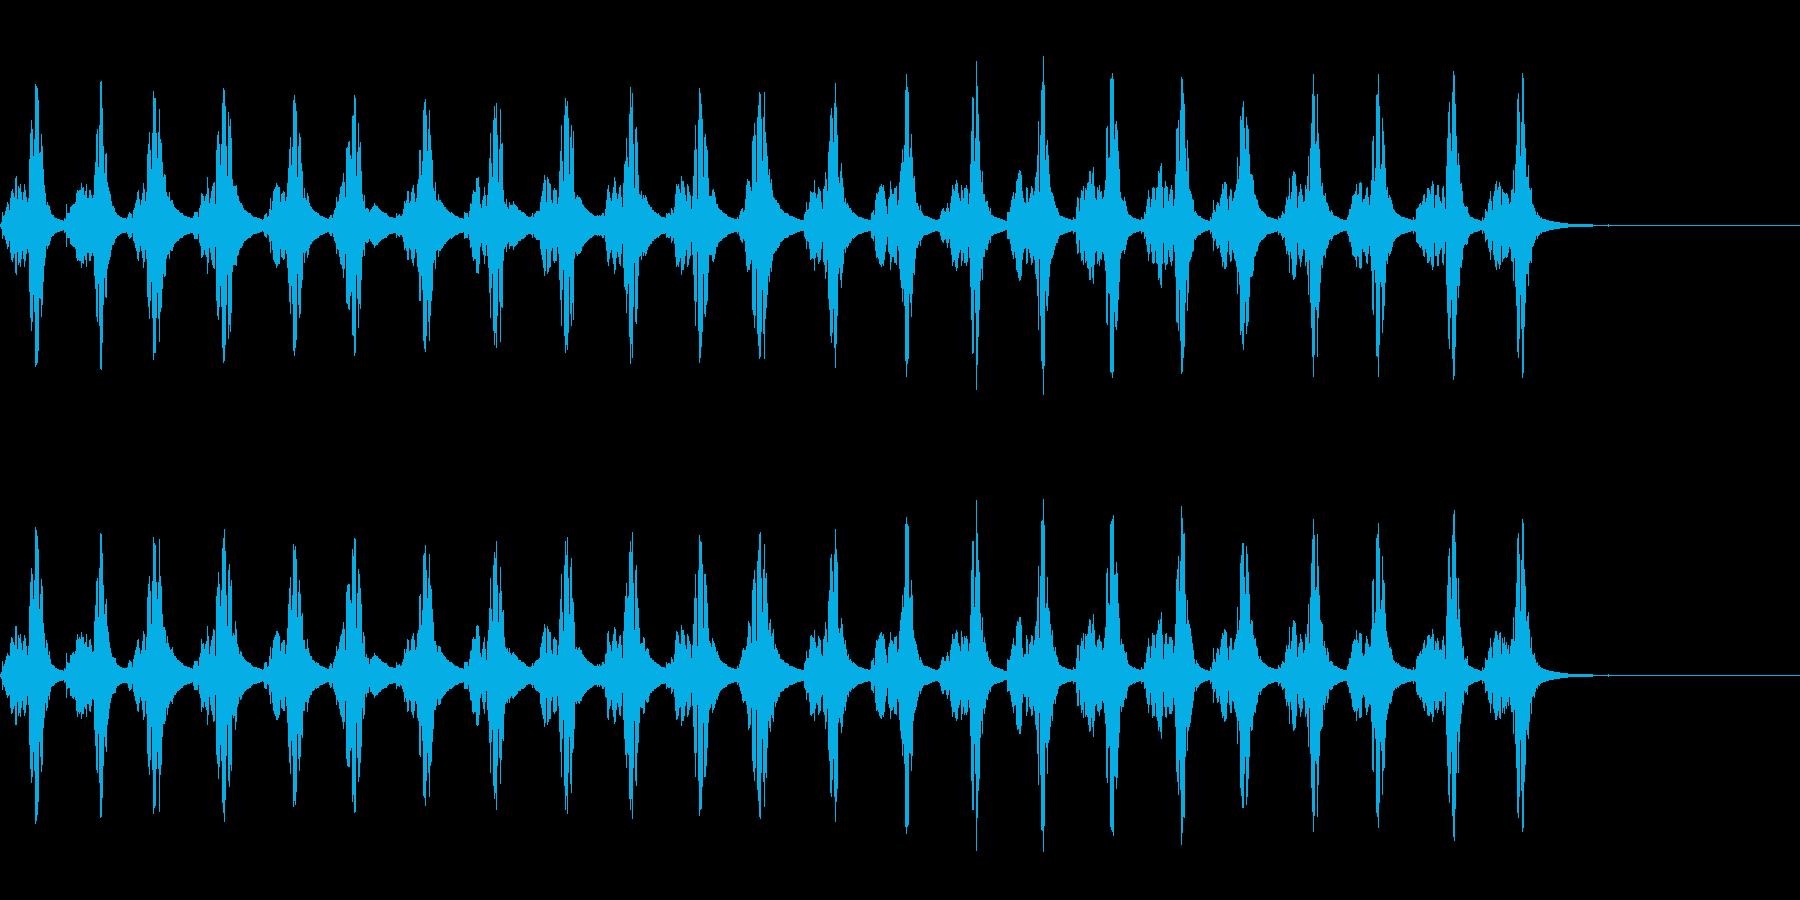 KANTピヨピヨ自主規制音7longの再生済みの波形